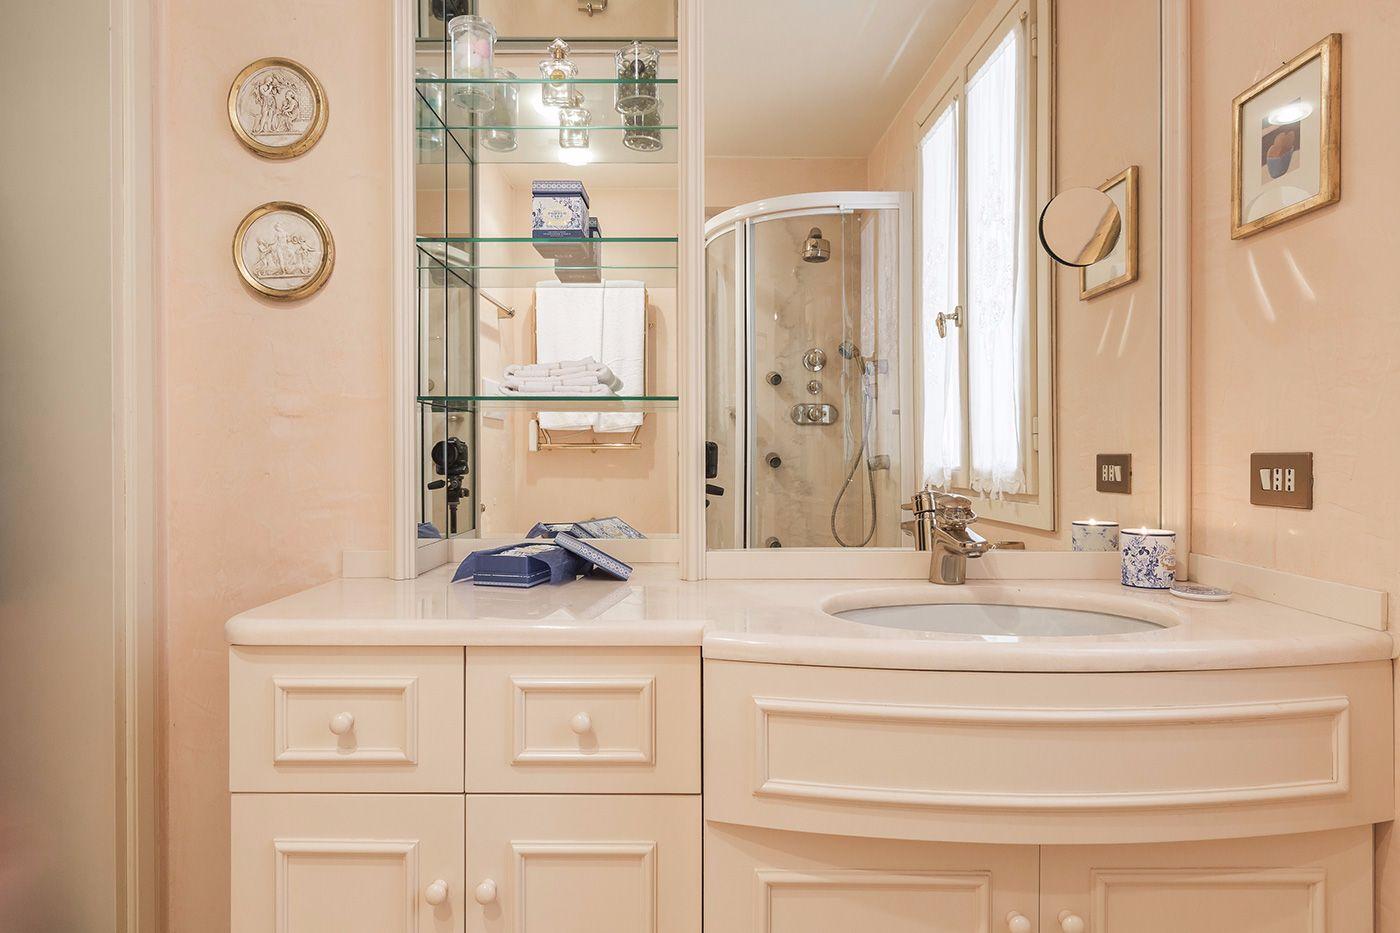 luxurious en-suite bathroom of the master bedroom